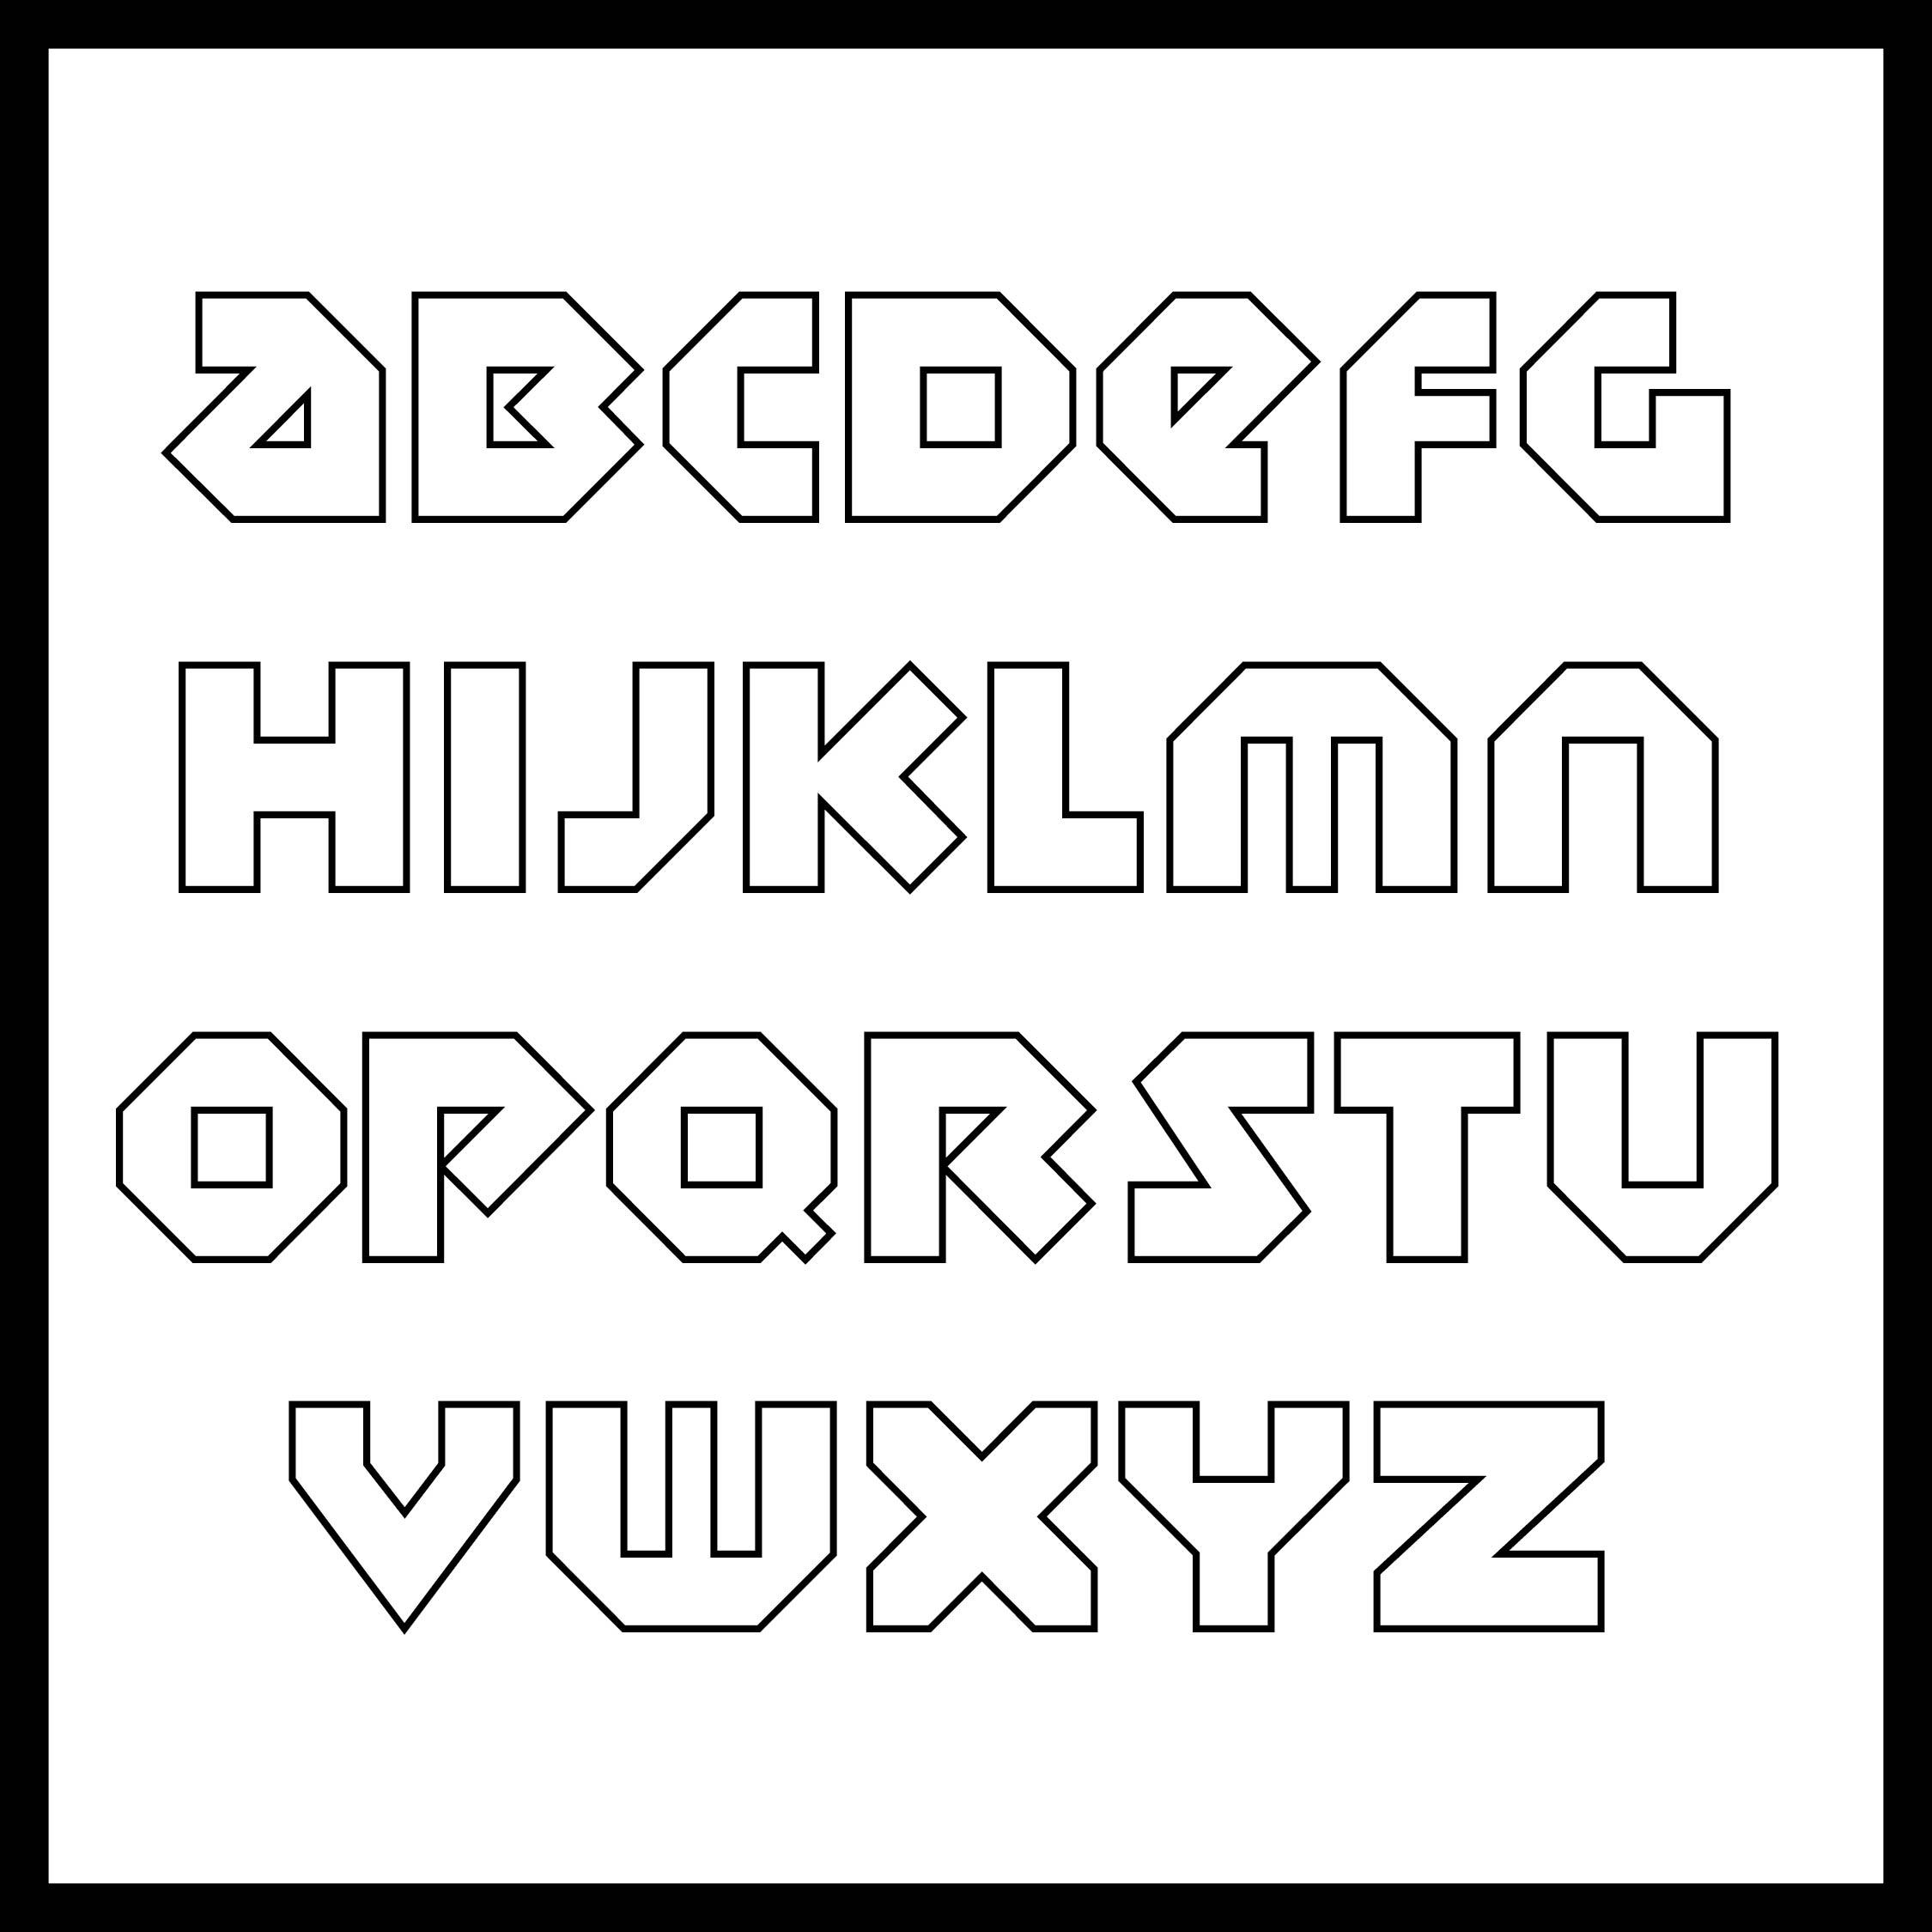 Printable Block Letter Stencils